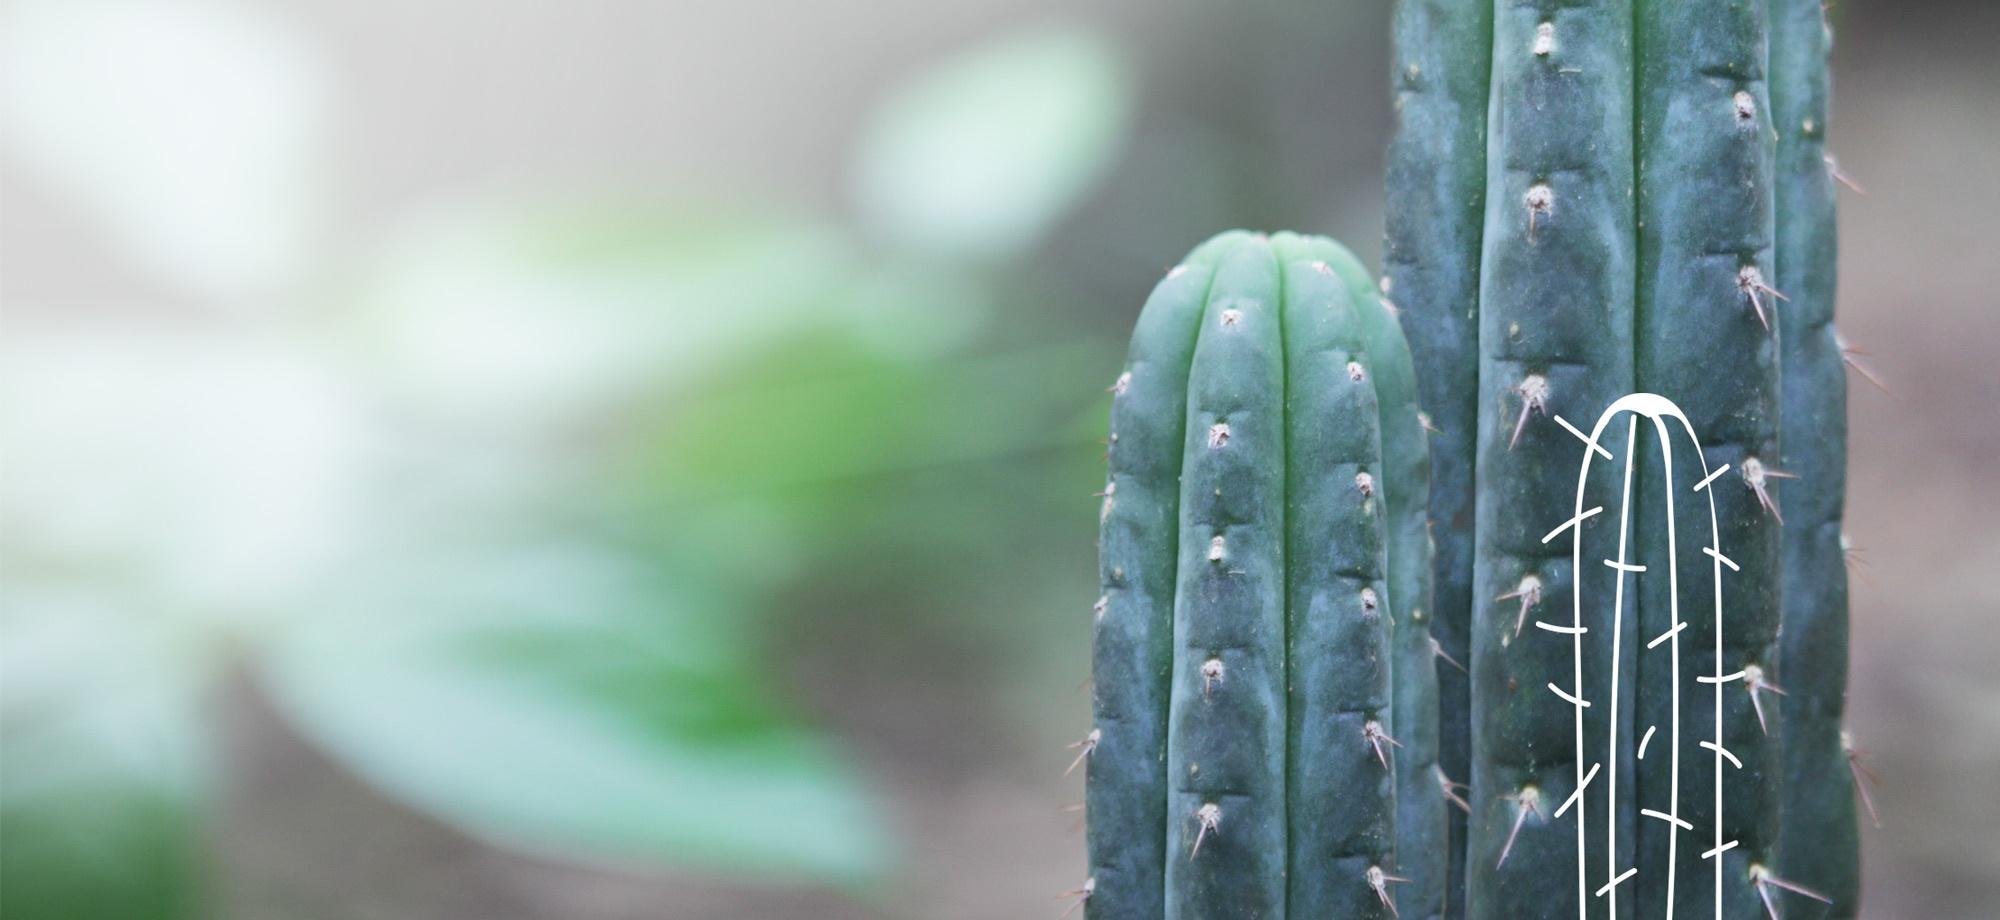 Plant Medicines & well-being Retreat - Vikara in Ecuador